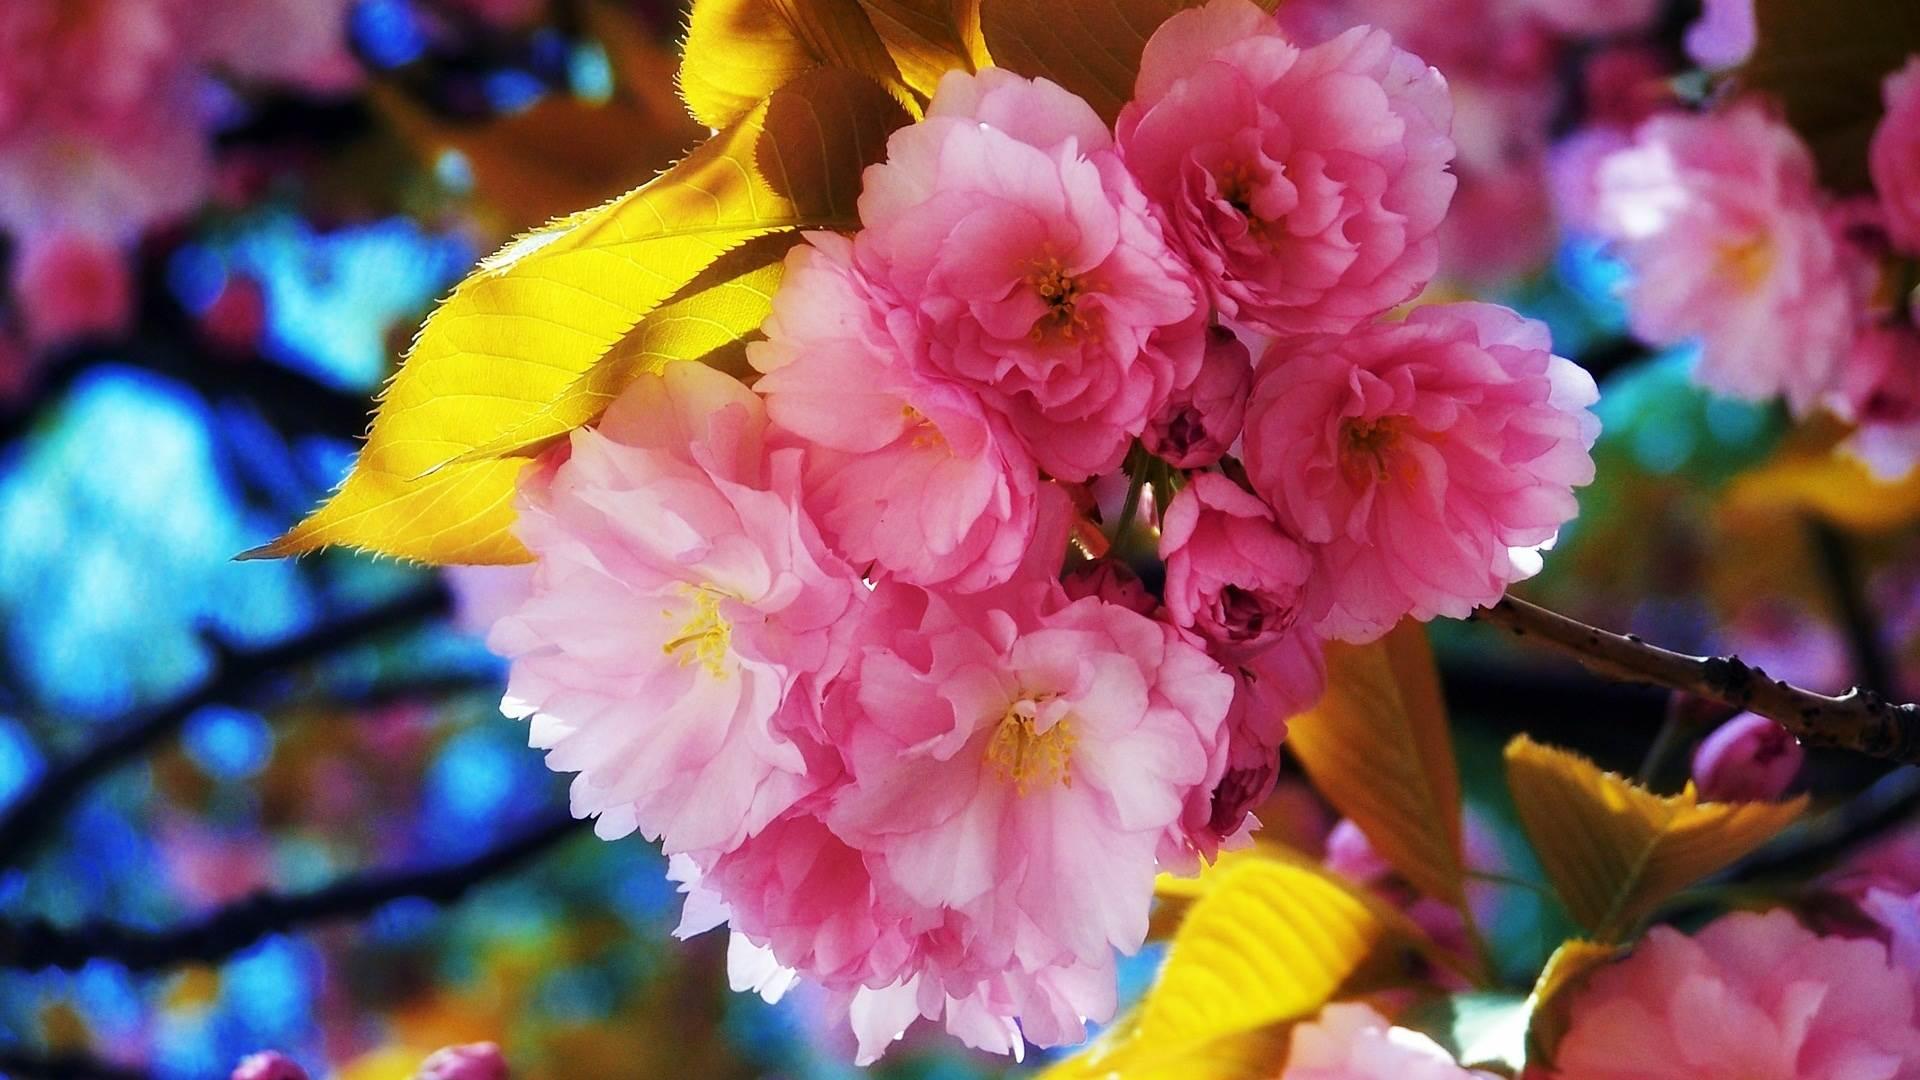 Flower Garden Wallpaper Free Download Fresh Flowers 1920x1080